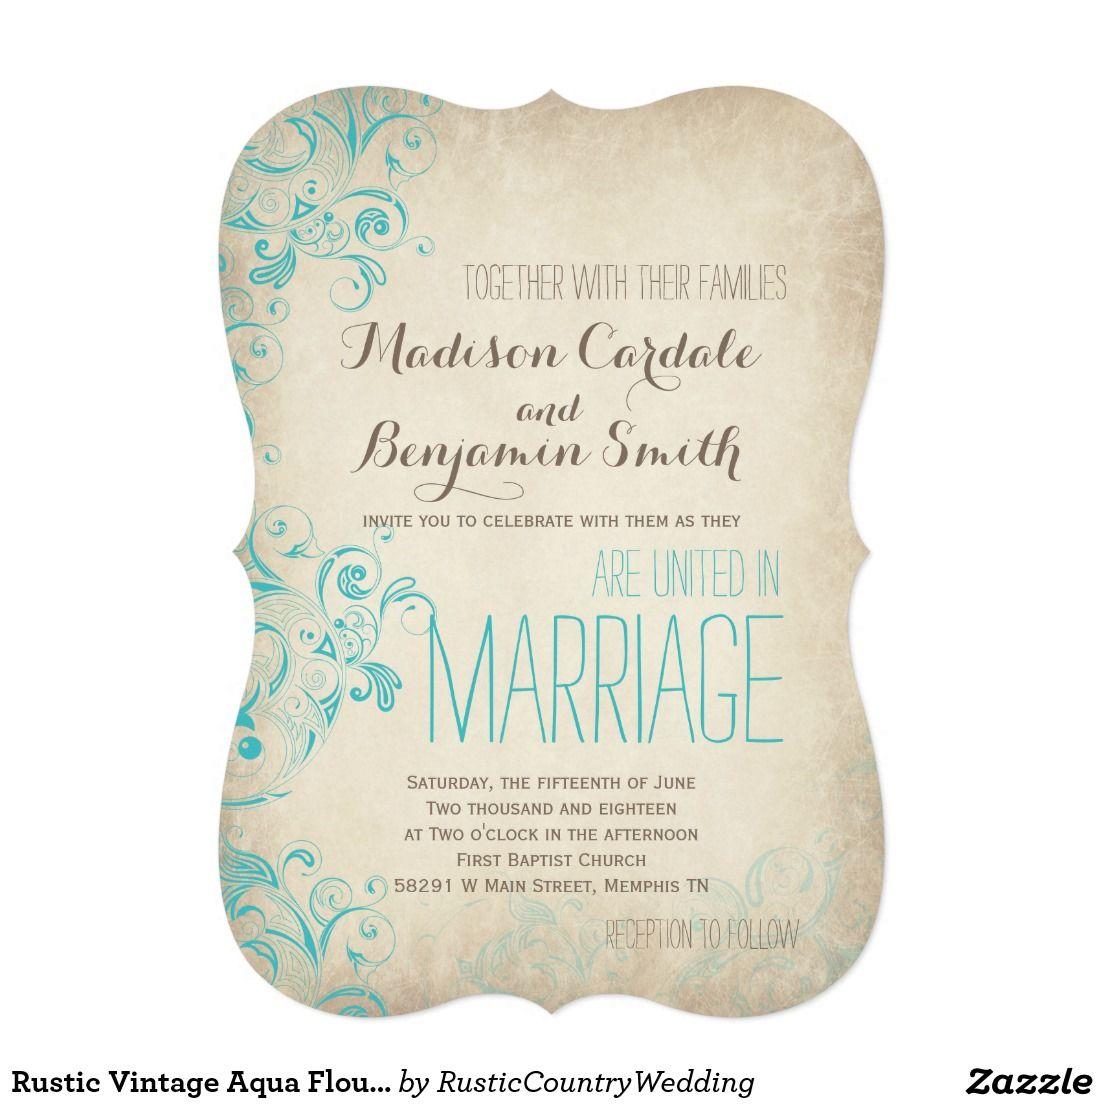 Rustic Vintage Aqua Flourish Wedding Invitations | Typography ...